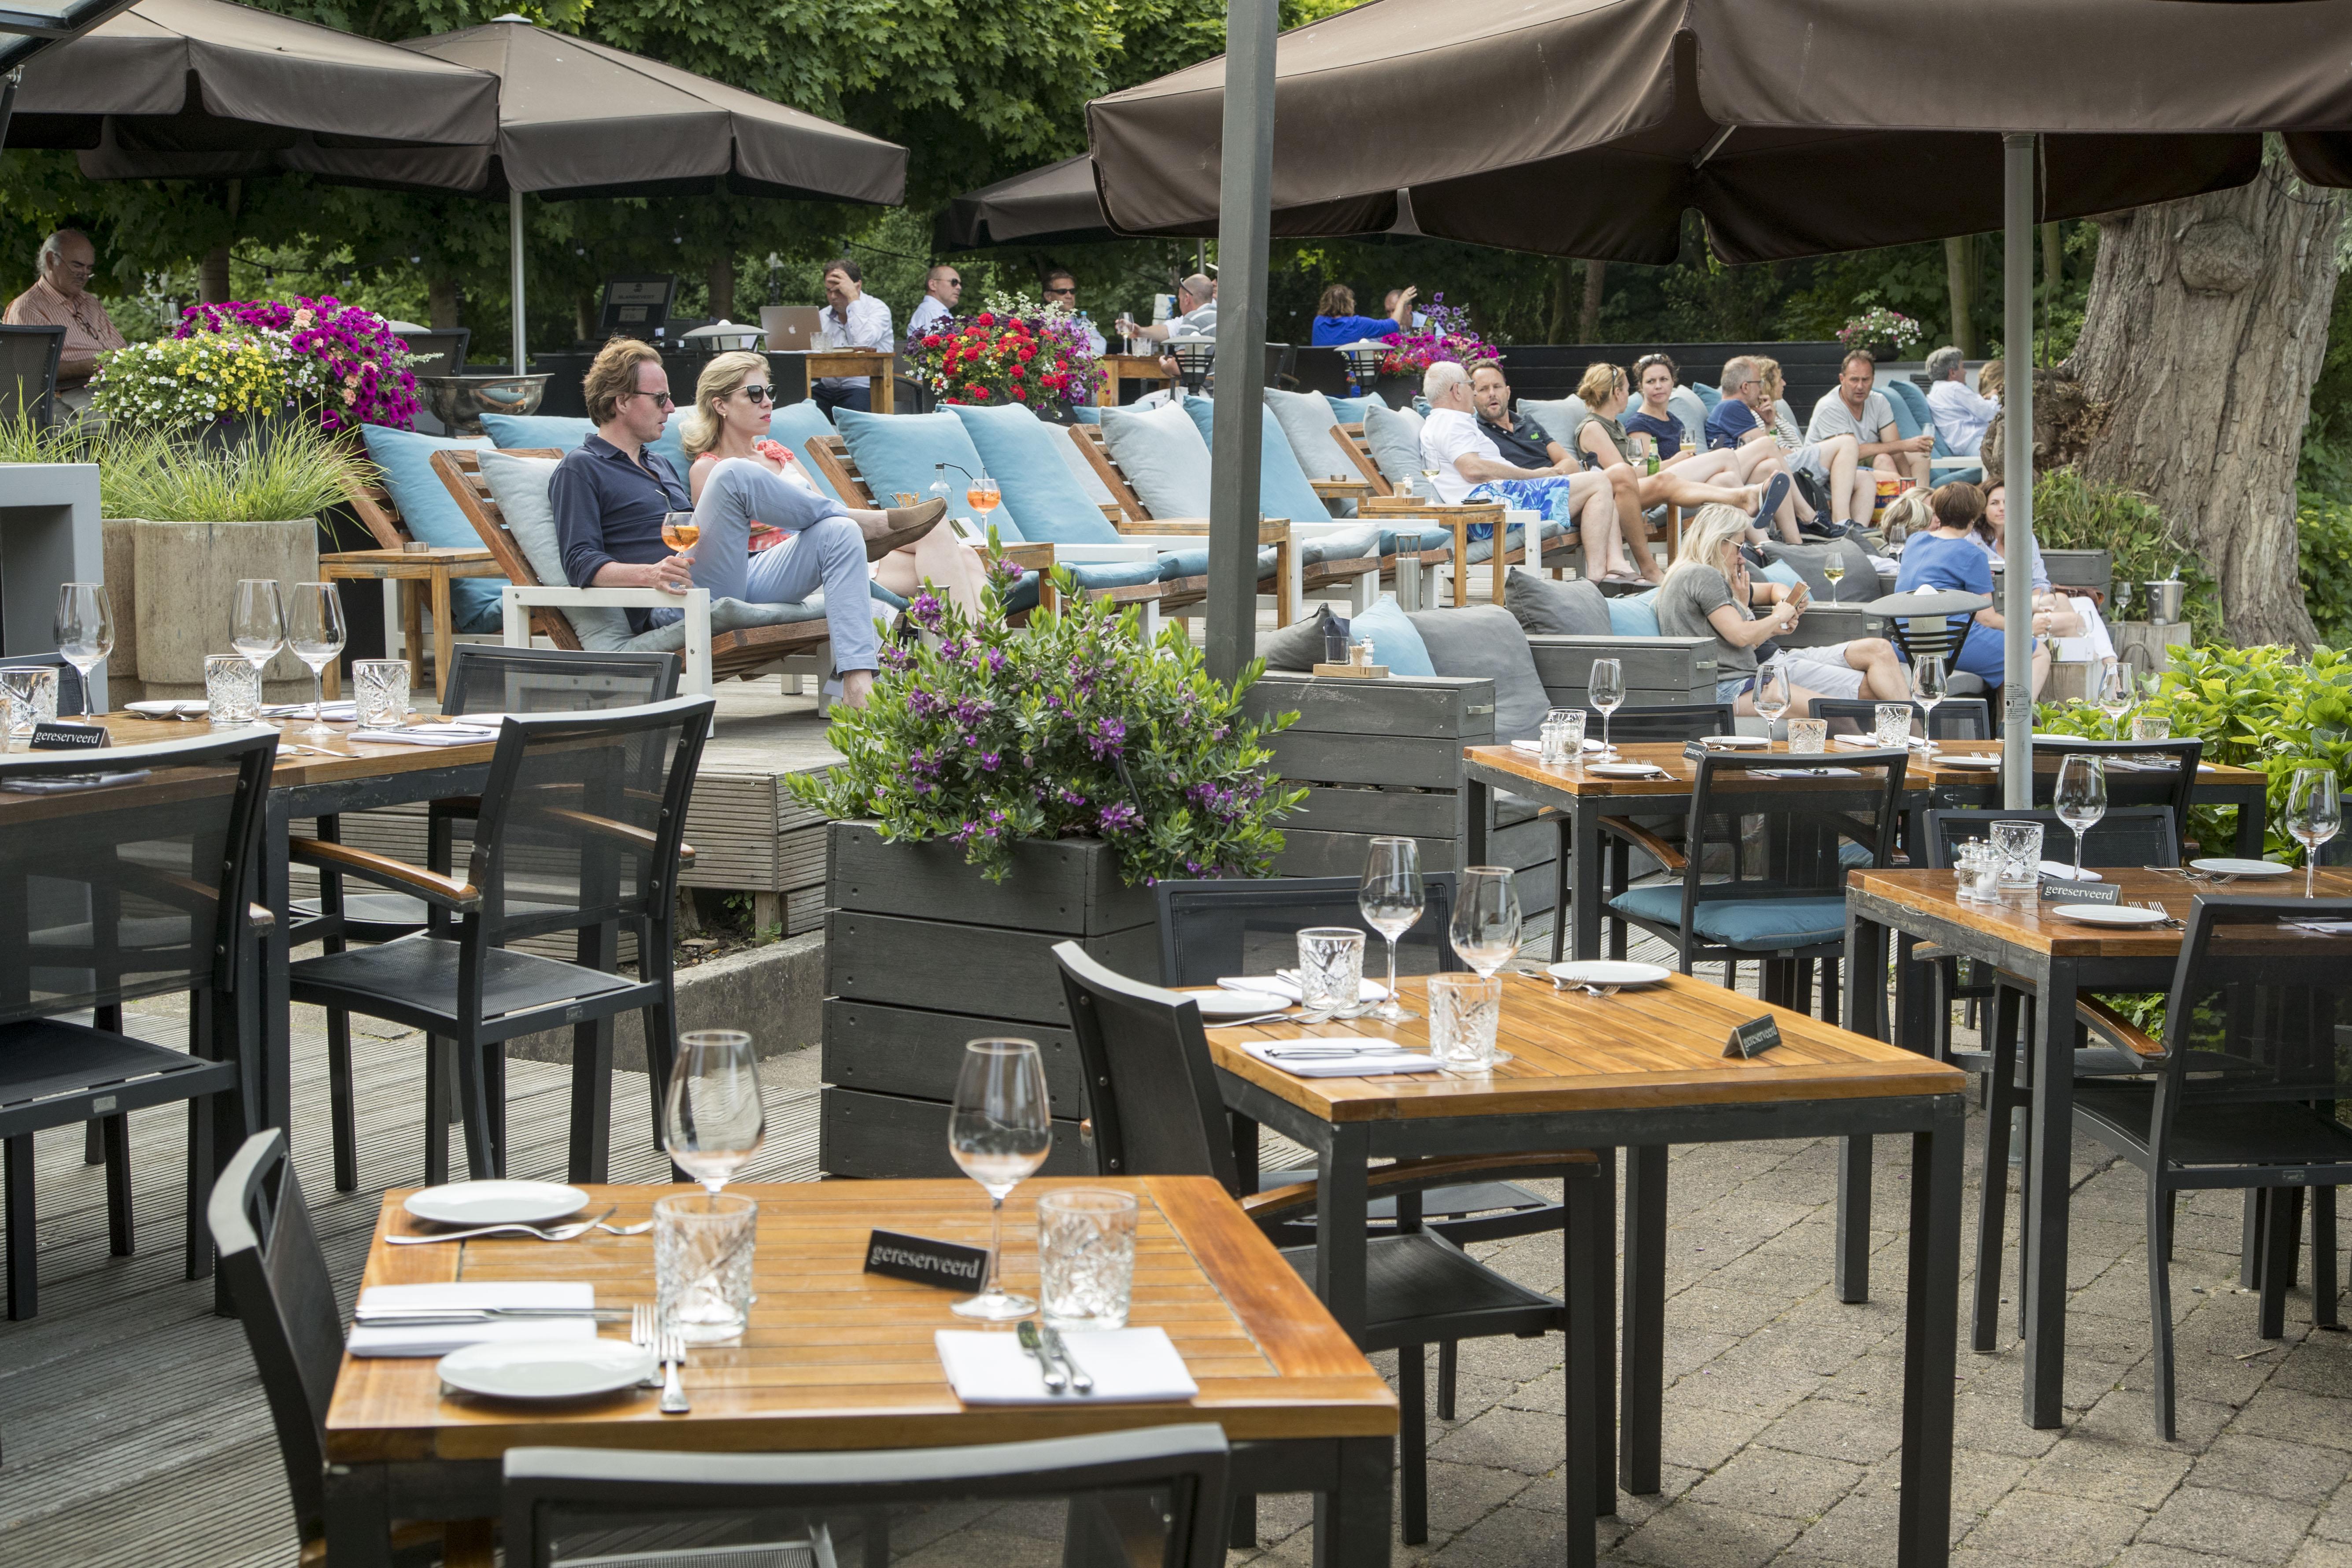 Horeca Meubels Amsterdam : Trends in terrasmeubilair horeca van rotanstoel tot mix van kleuren